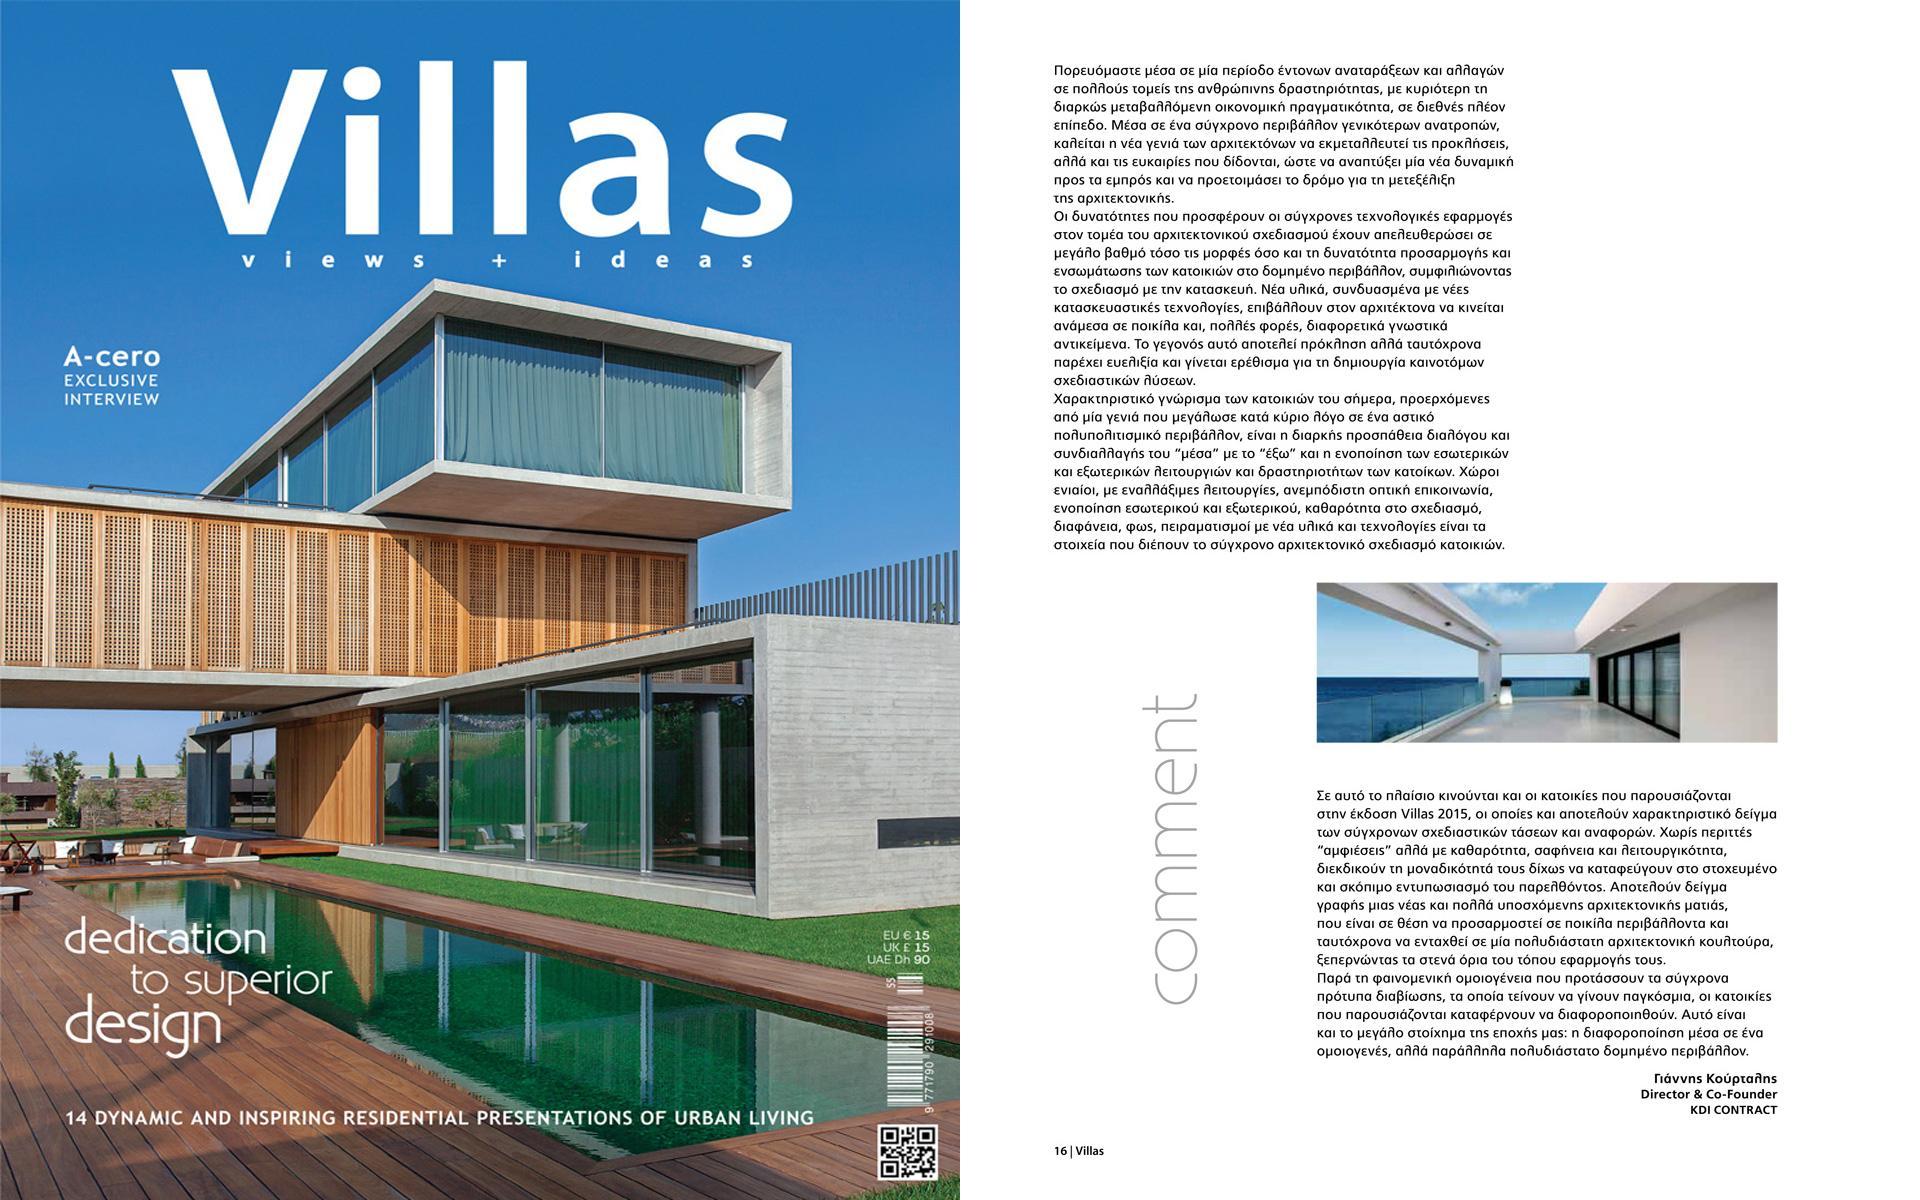 Editorial Γιάννη Κούρταλη περιοδικό VILLAS 2015 - KDI CONTRACT